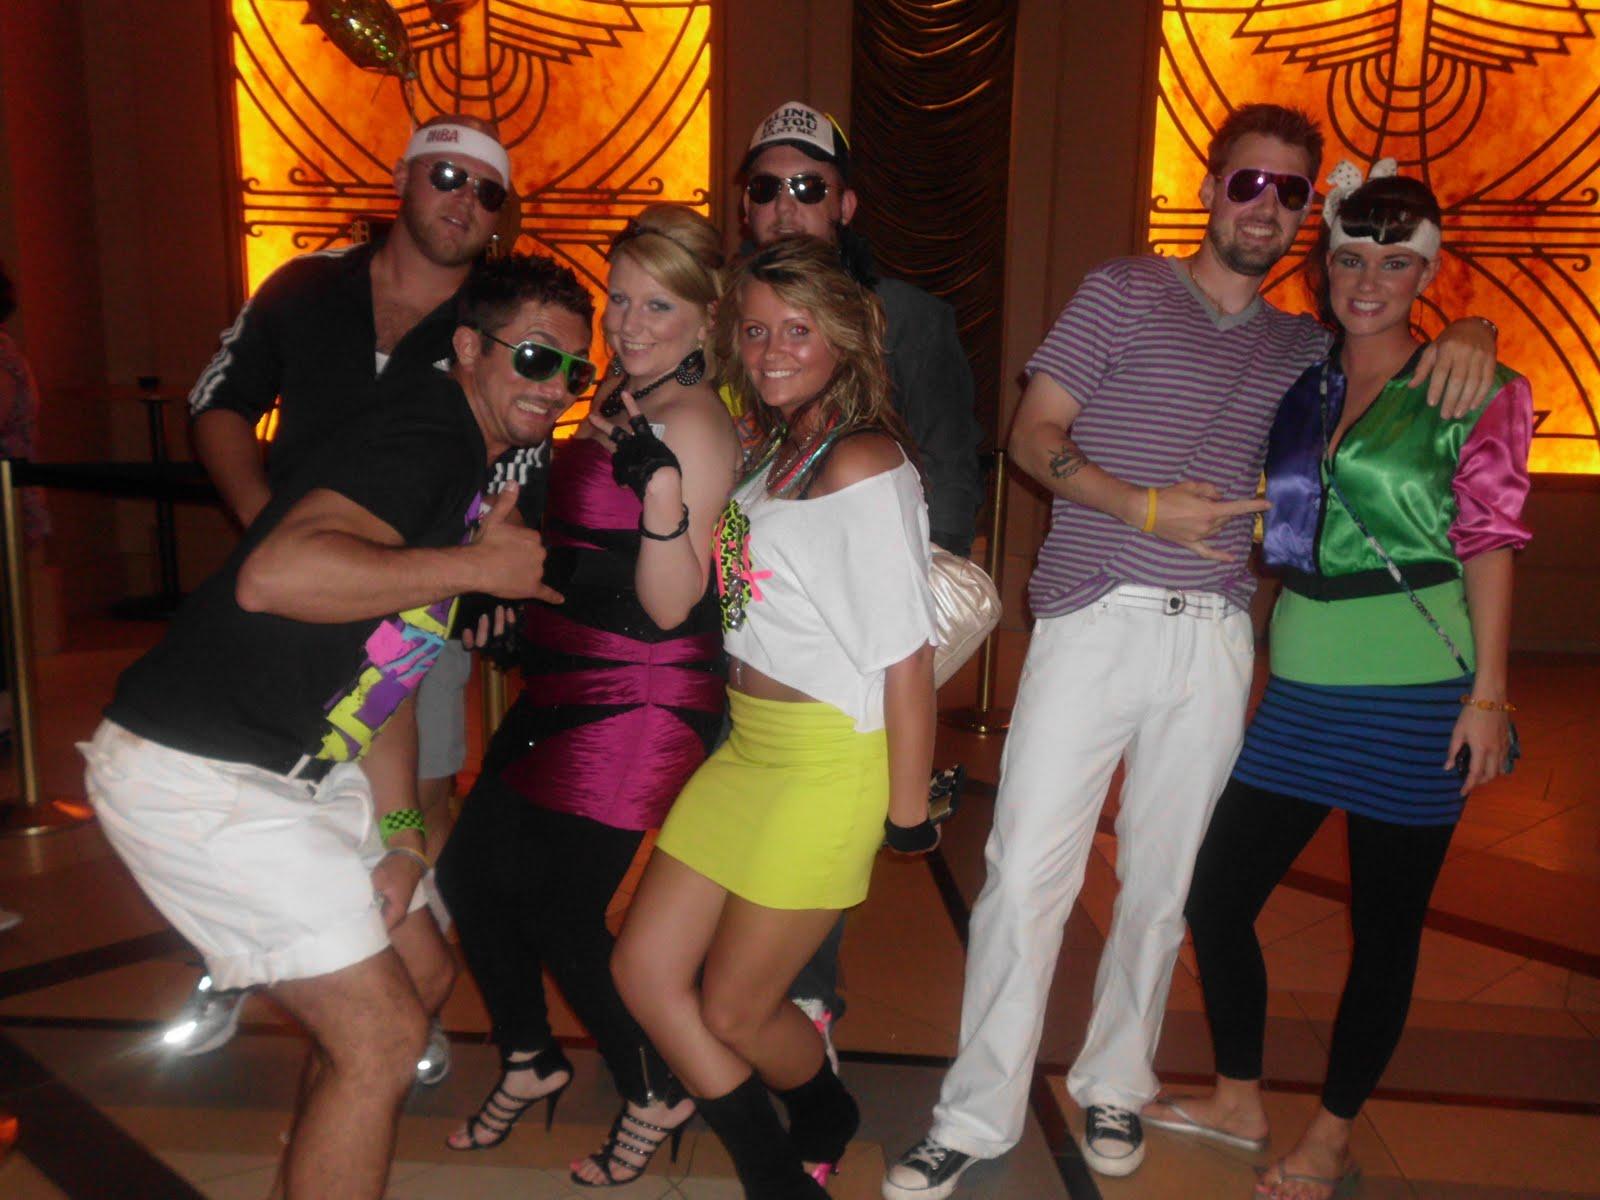 Boogie nights casino club atlantis hotel and casino paradise island